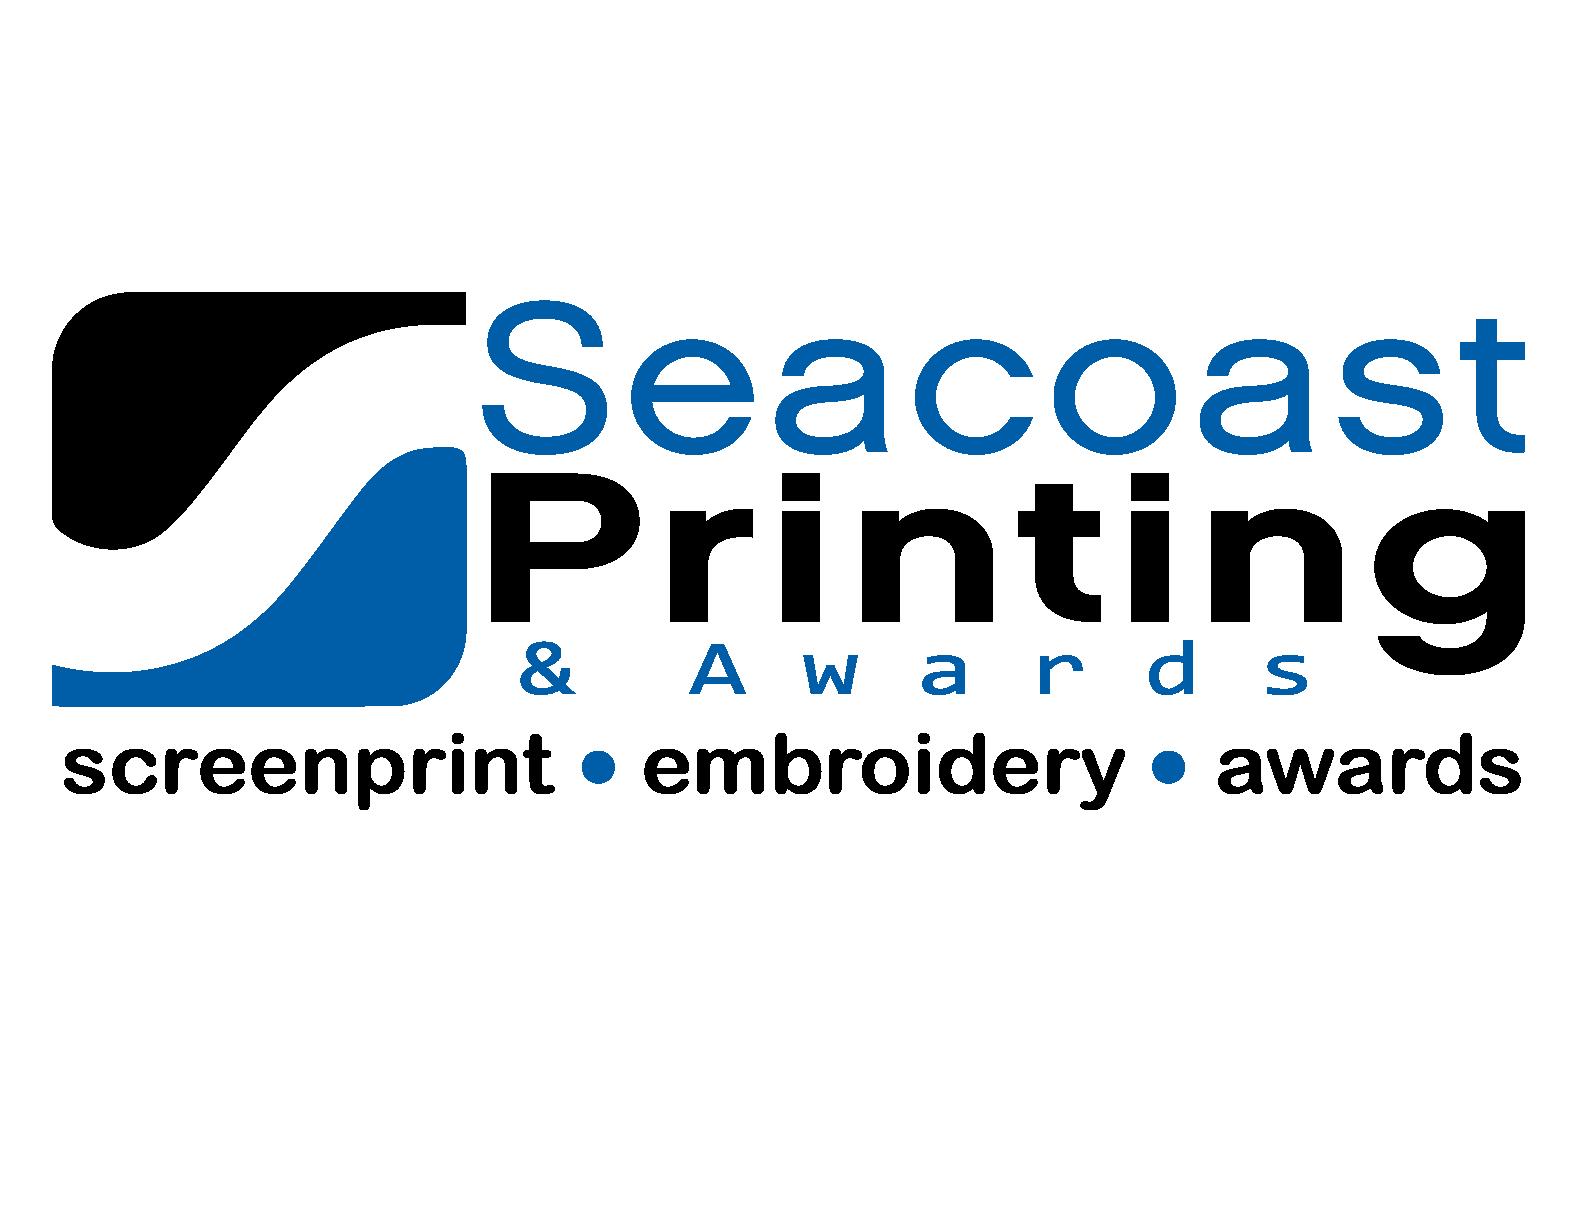 Seacoast Printing